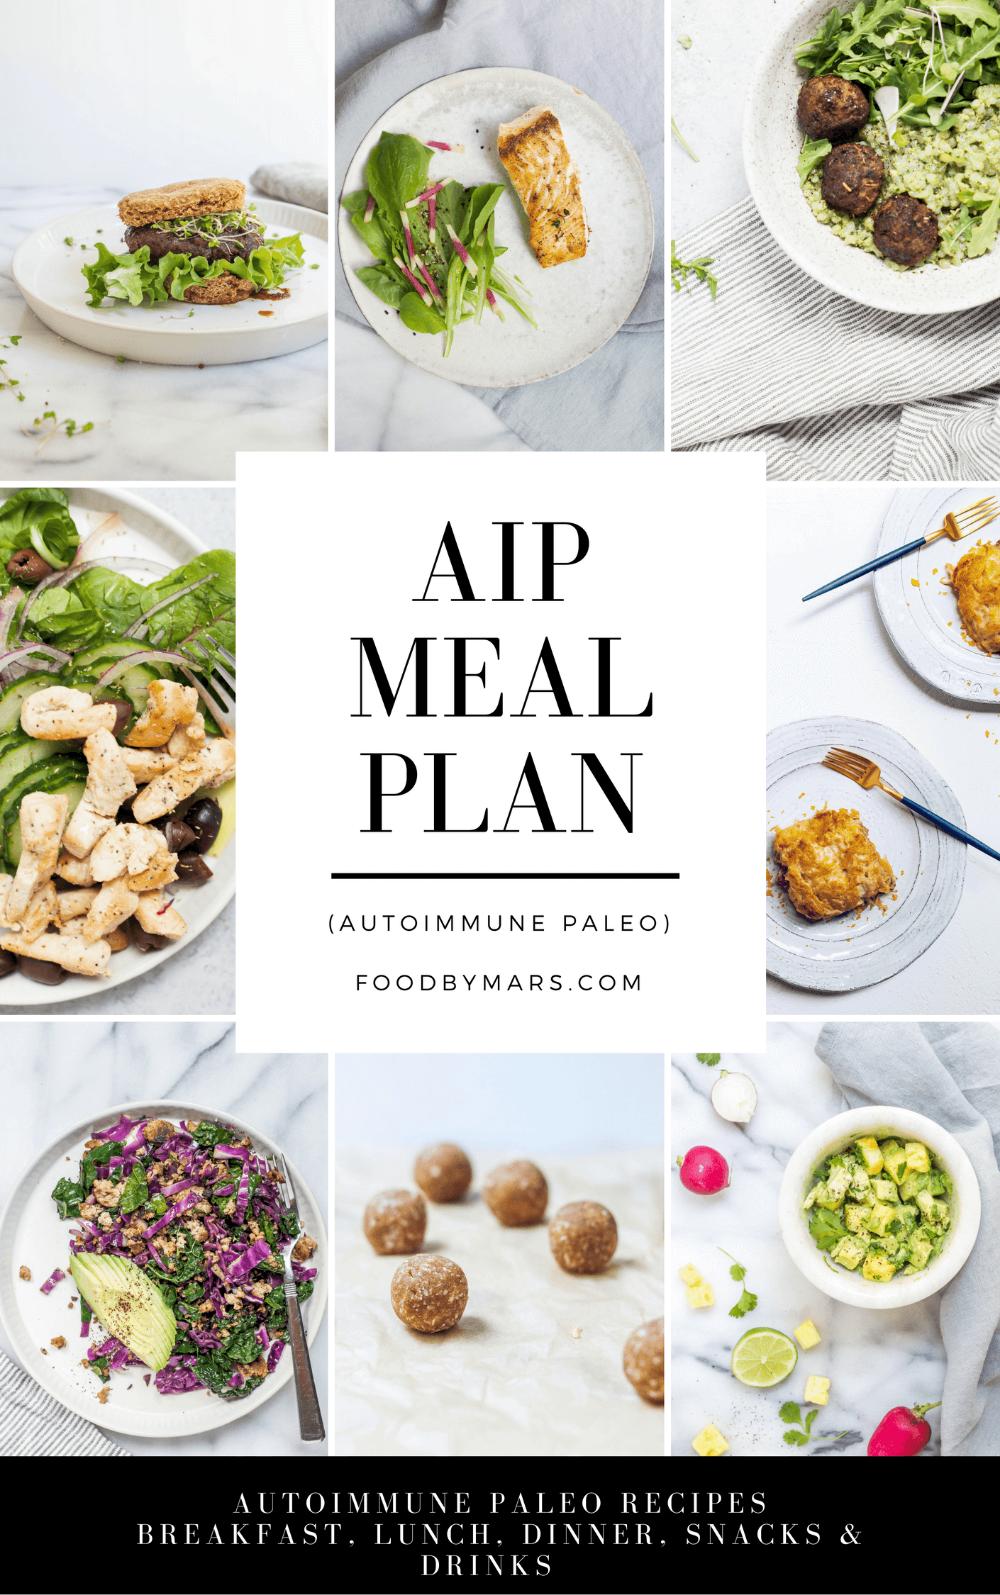 Paleo Autoimmun-Diät-Frühstück